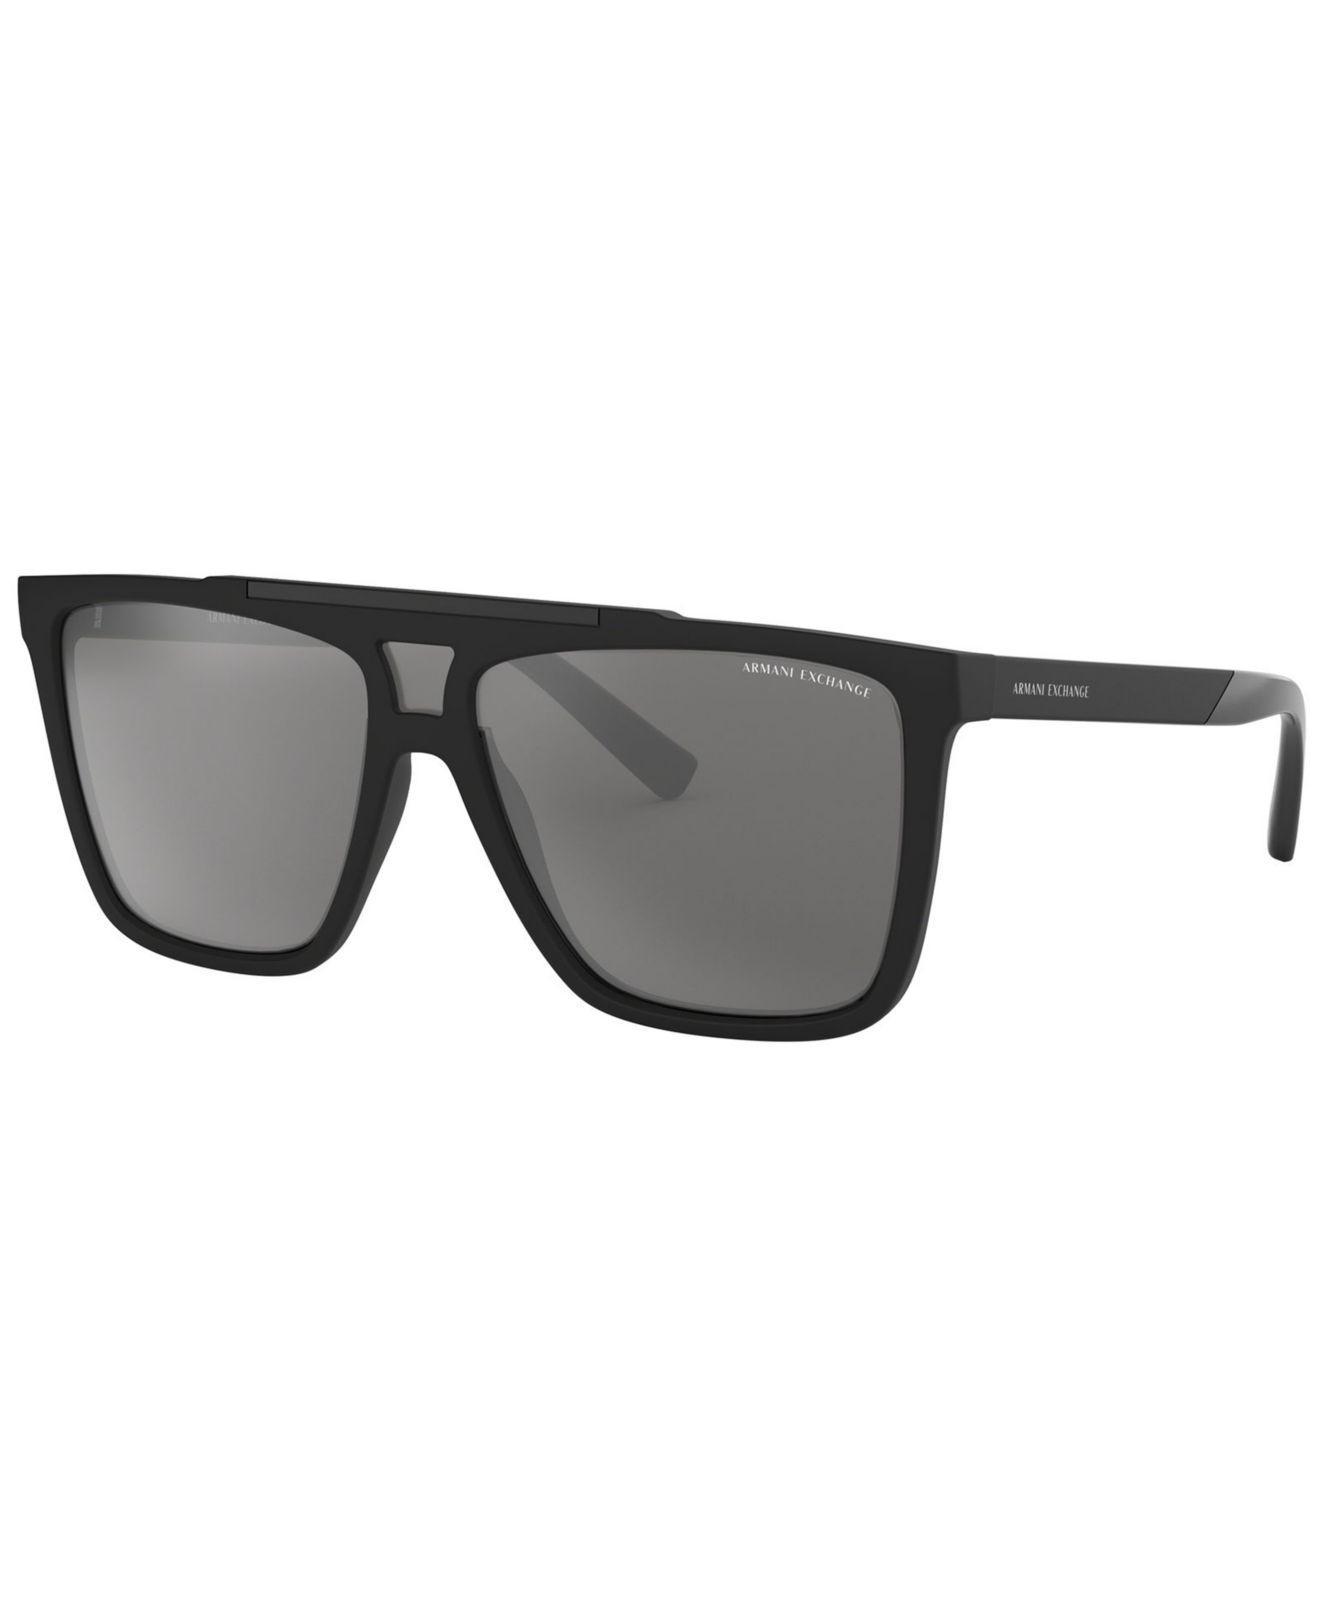 8b52ba73f7c2 Armani Exchange - Multicolor Sunglasses